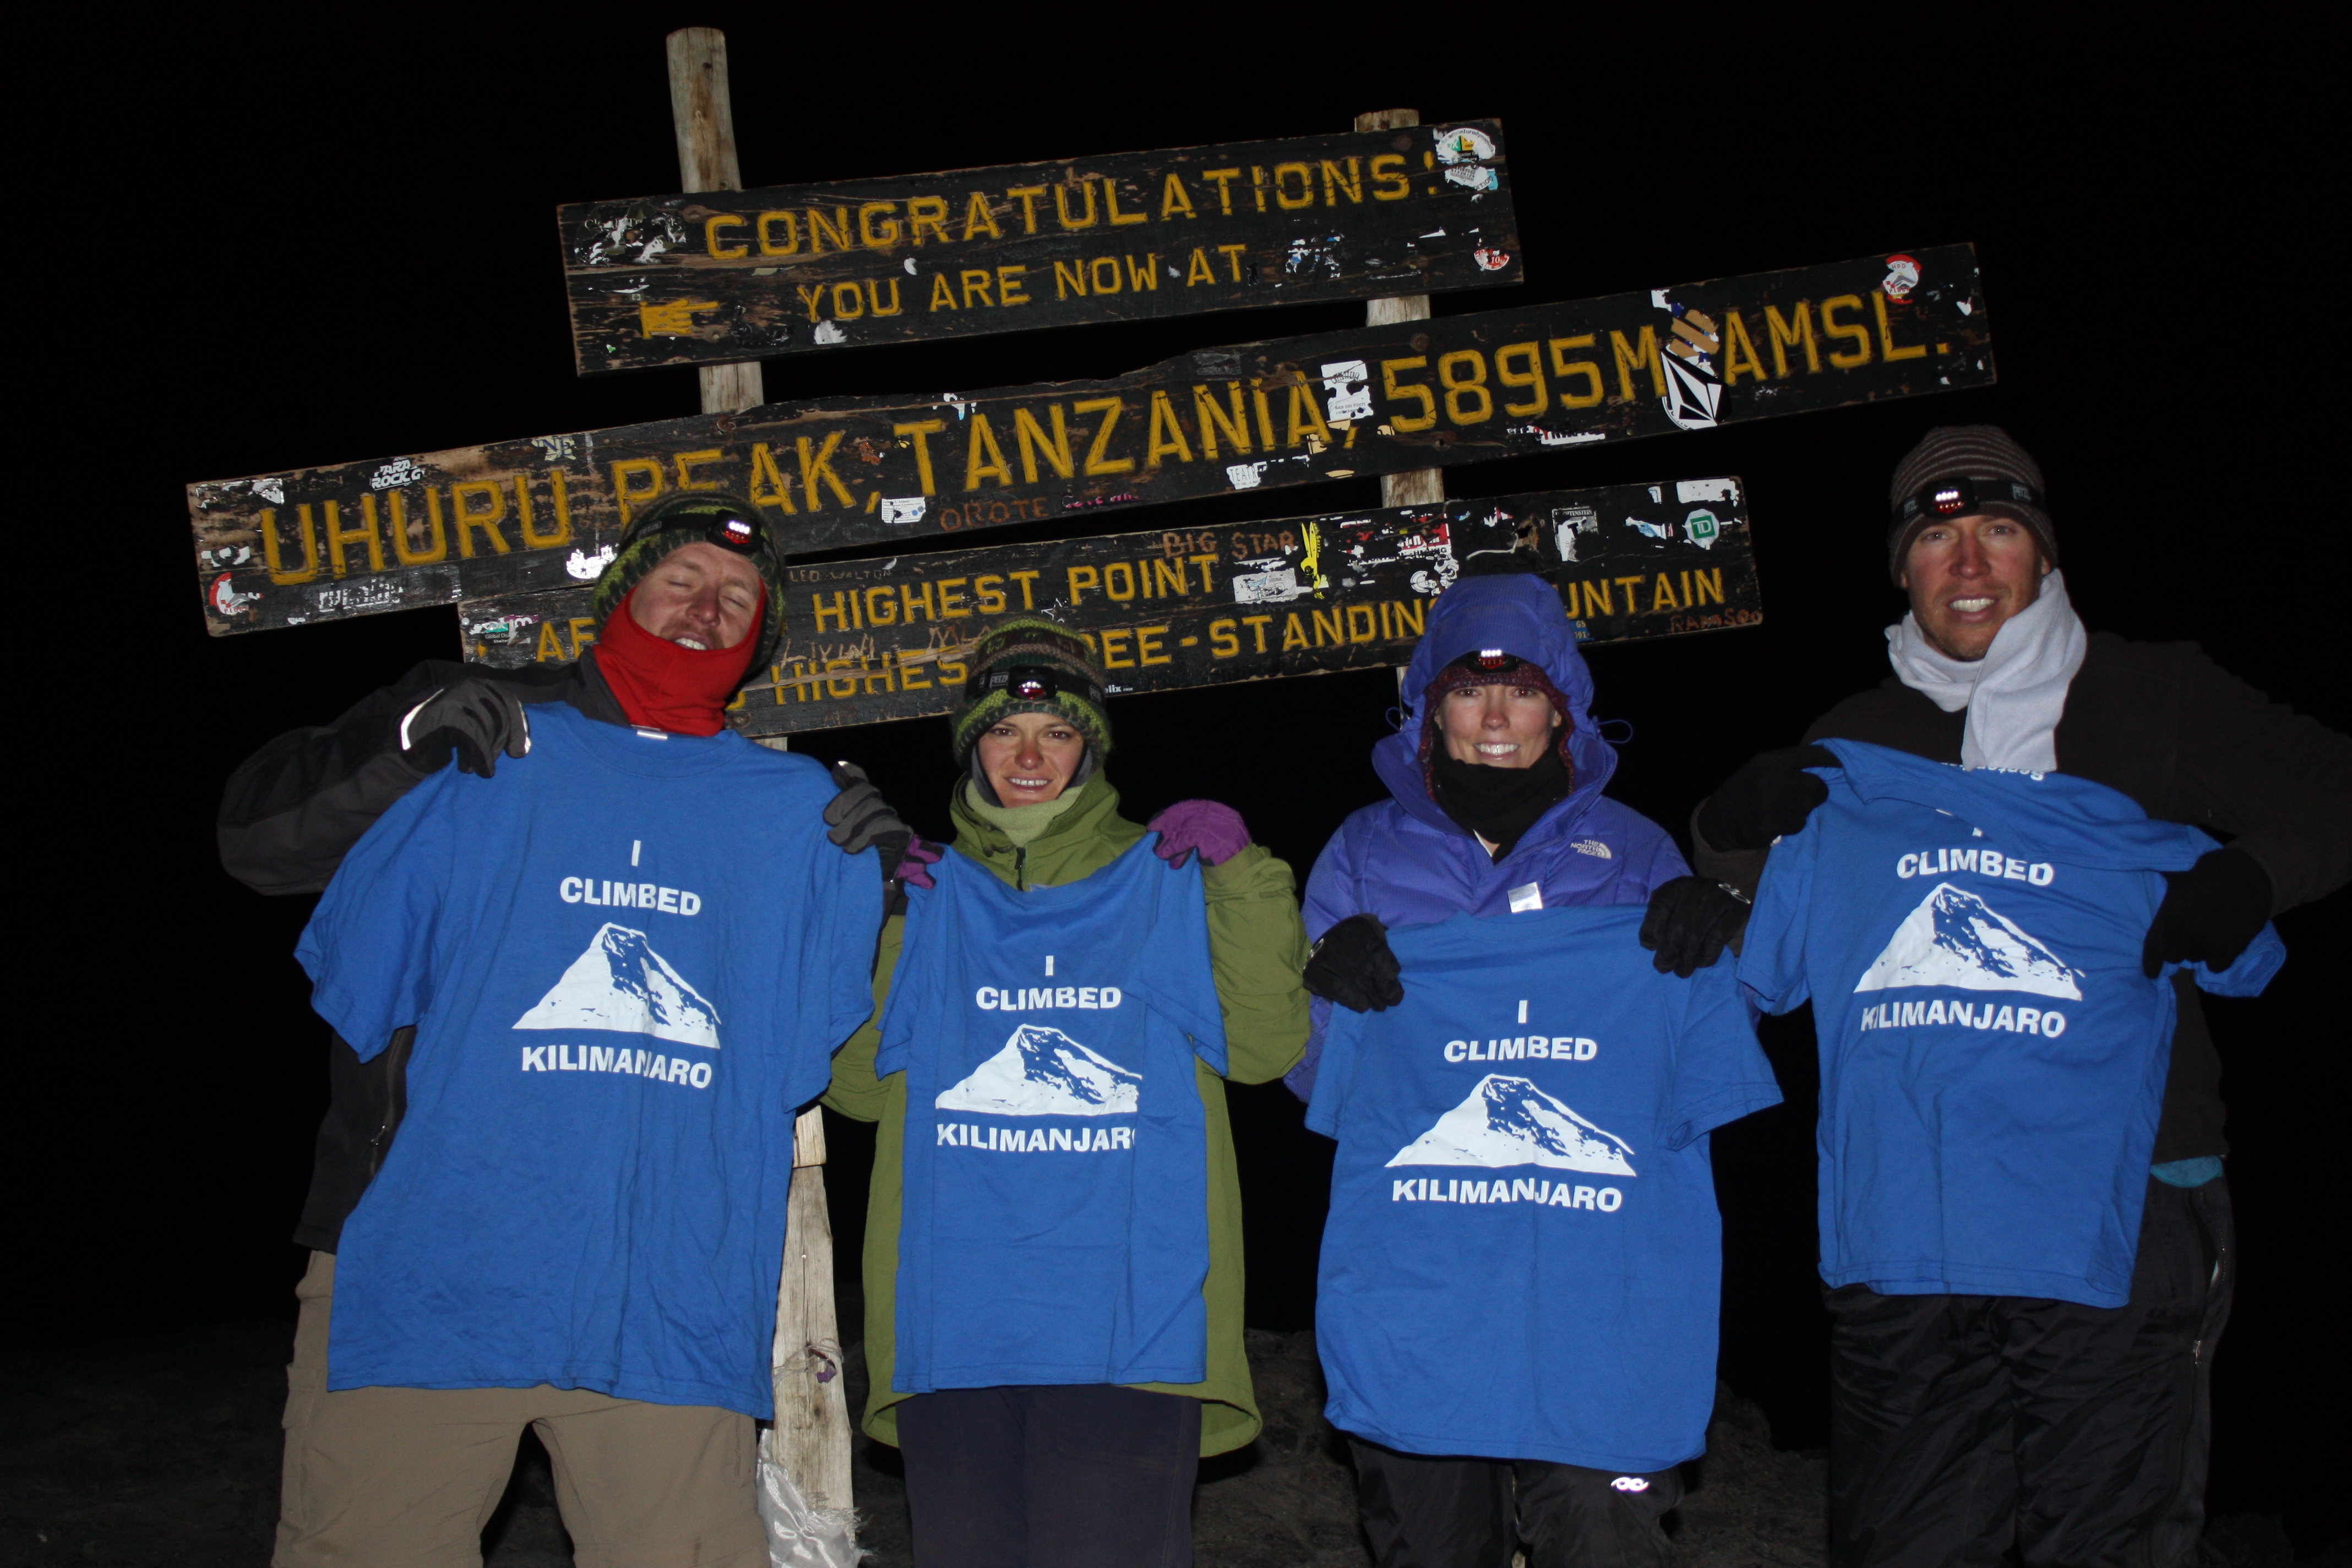 Custom T-Shirts for Mt. Kilimanjaro Summit - Shirt Design Ideas